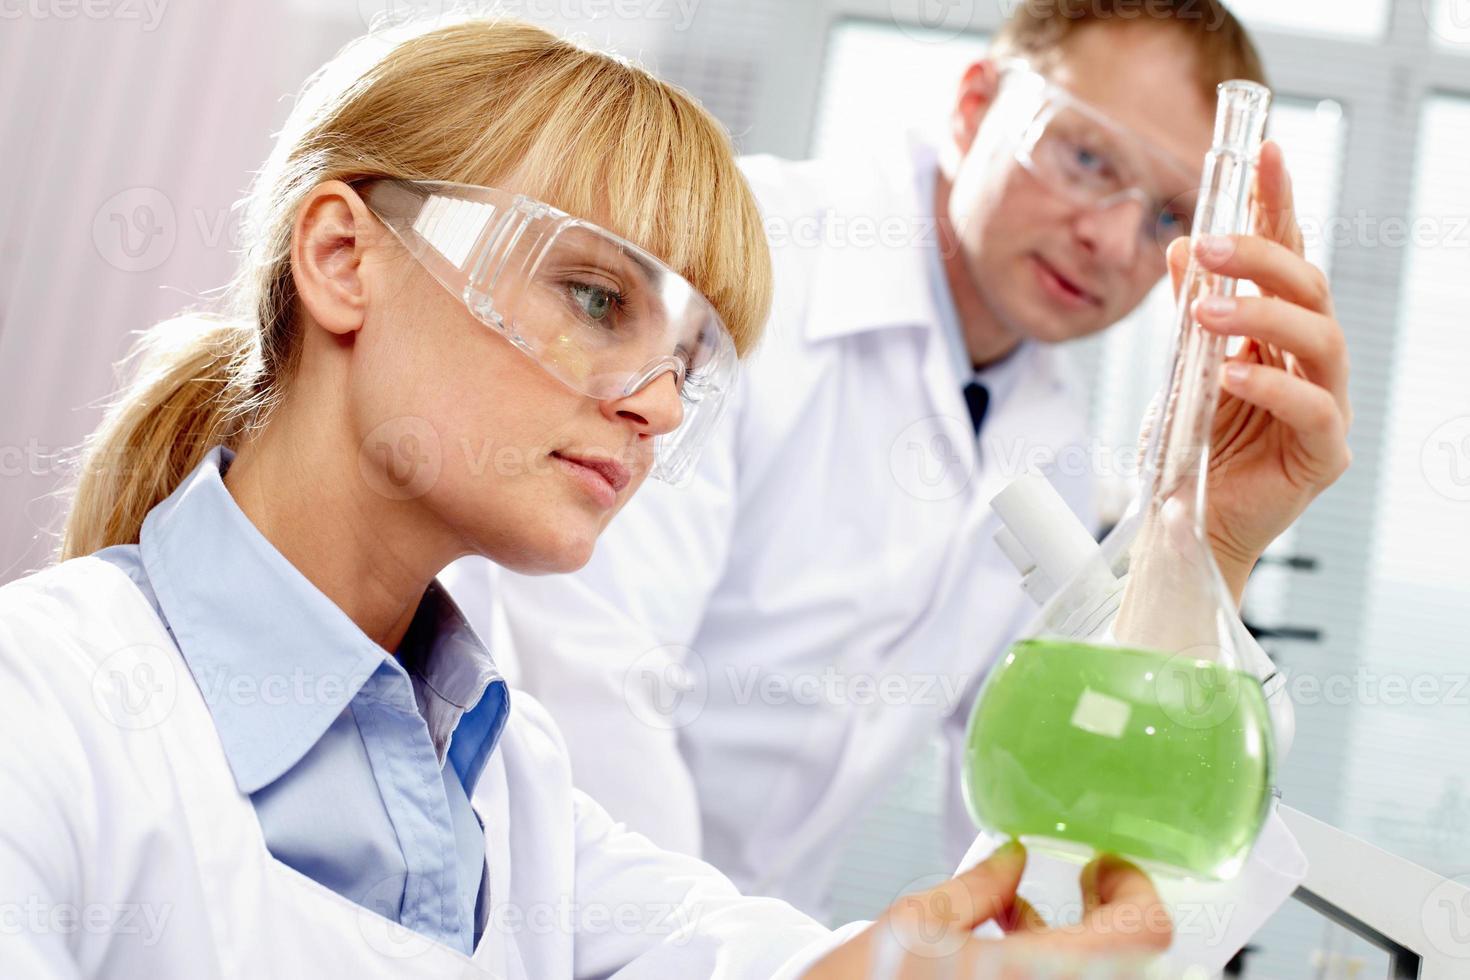 Chemist at work photo